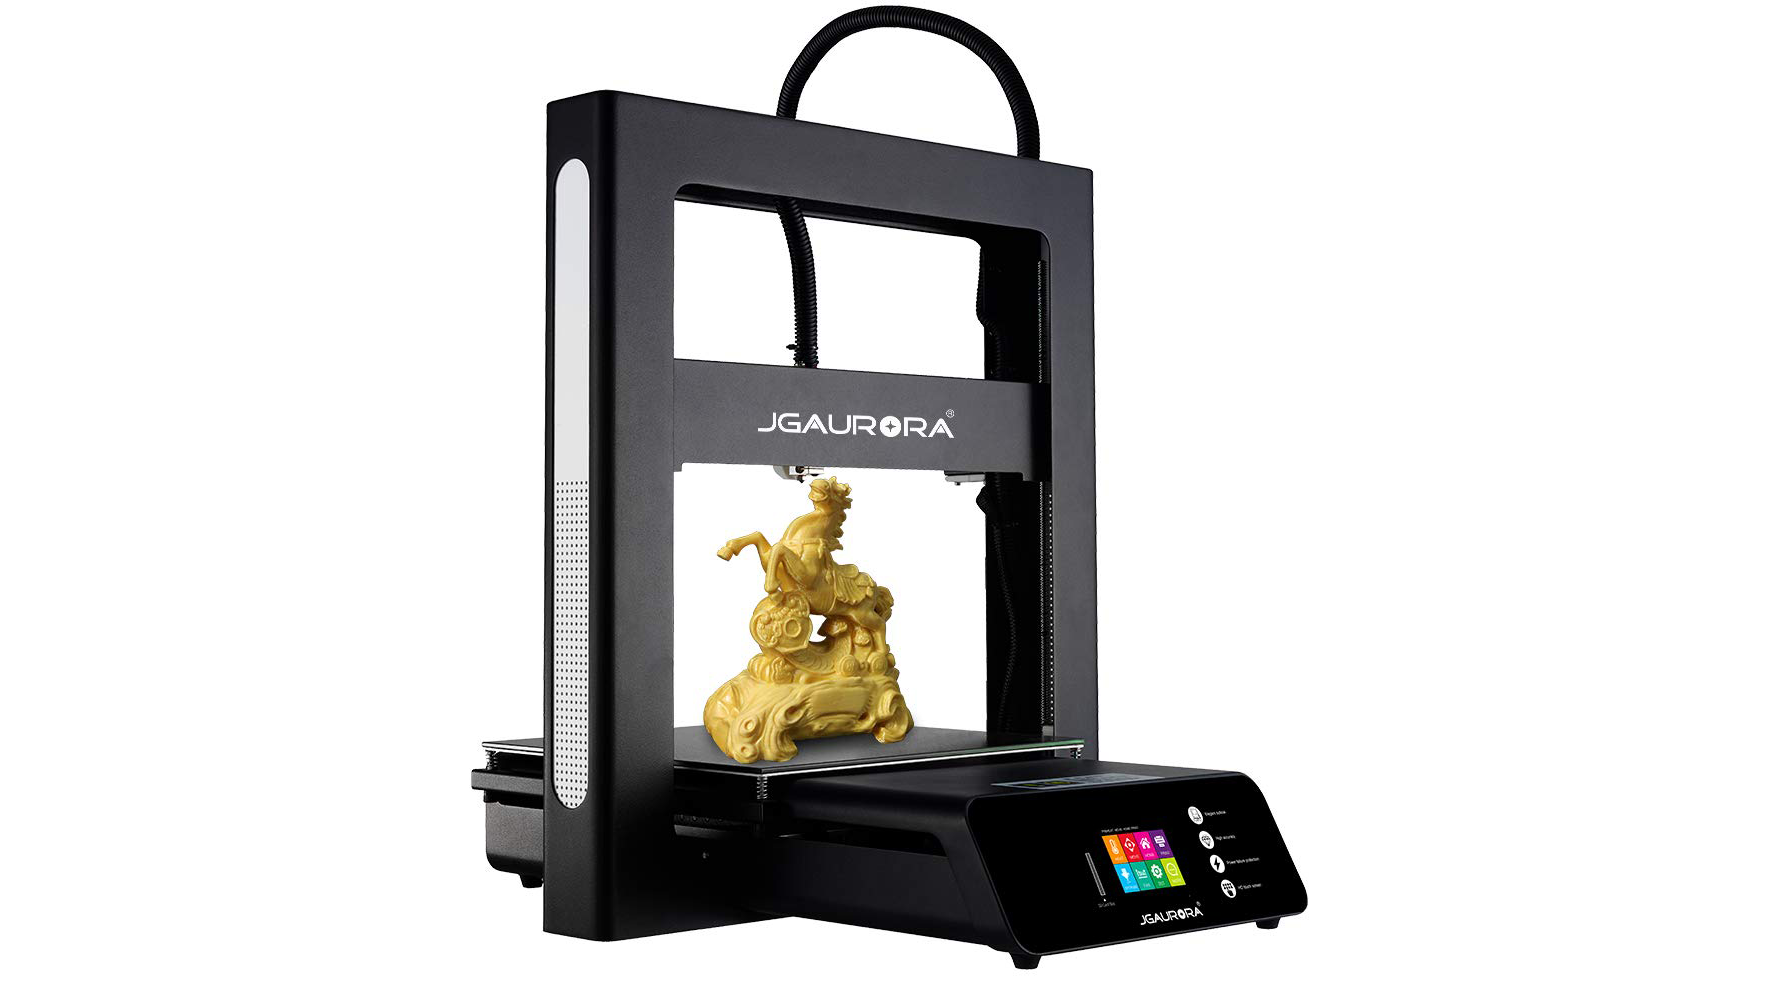 JGAurora A5S 3D Printer: Review the Specs | All3DP